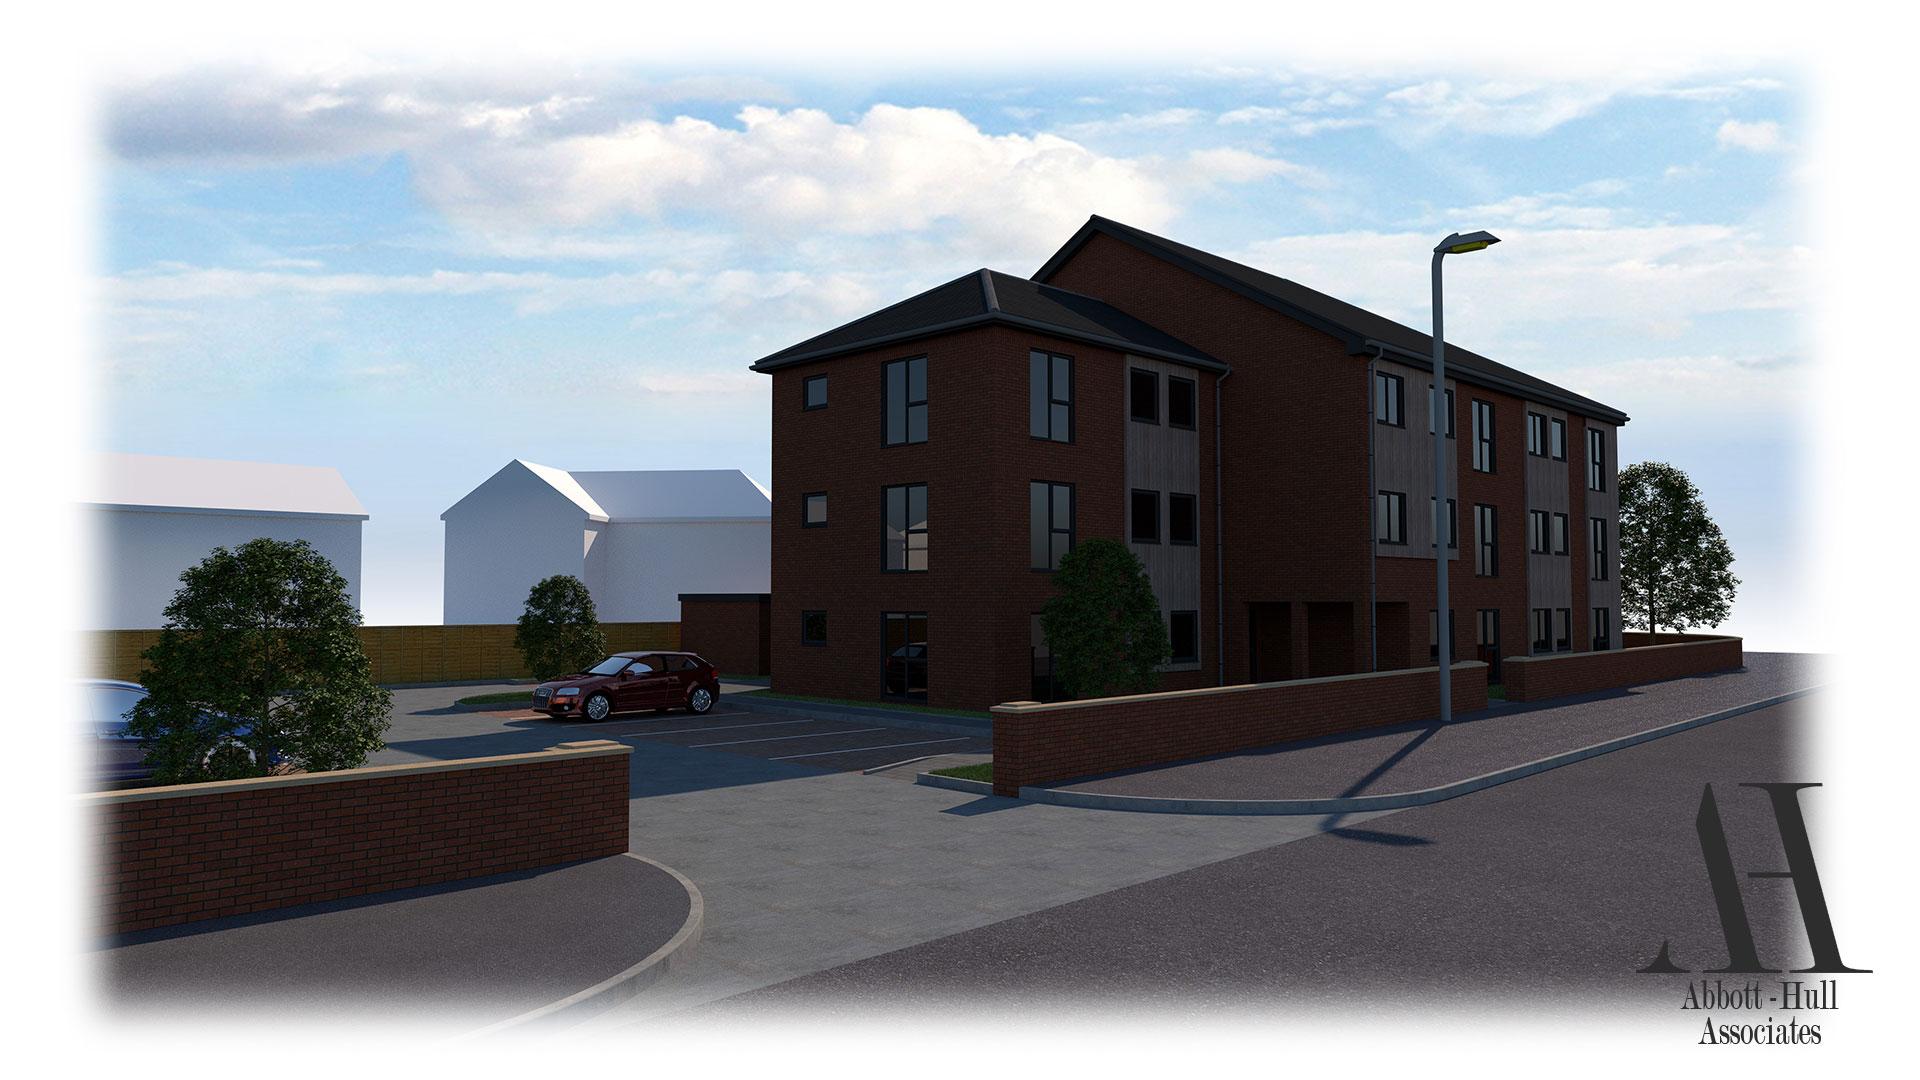 Waterloo Road, Blackpool, New Apartment Block - Proposed Visual B